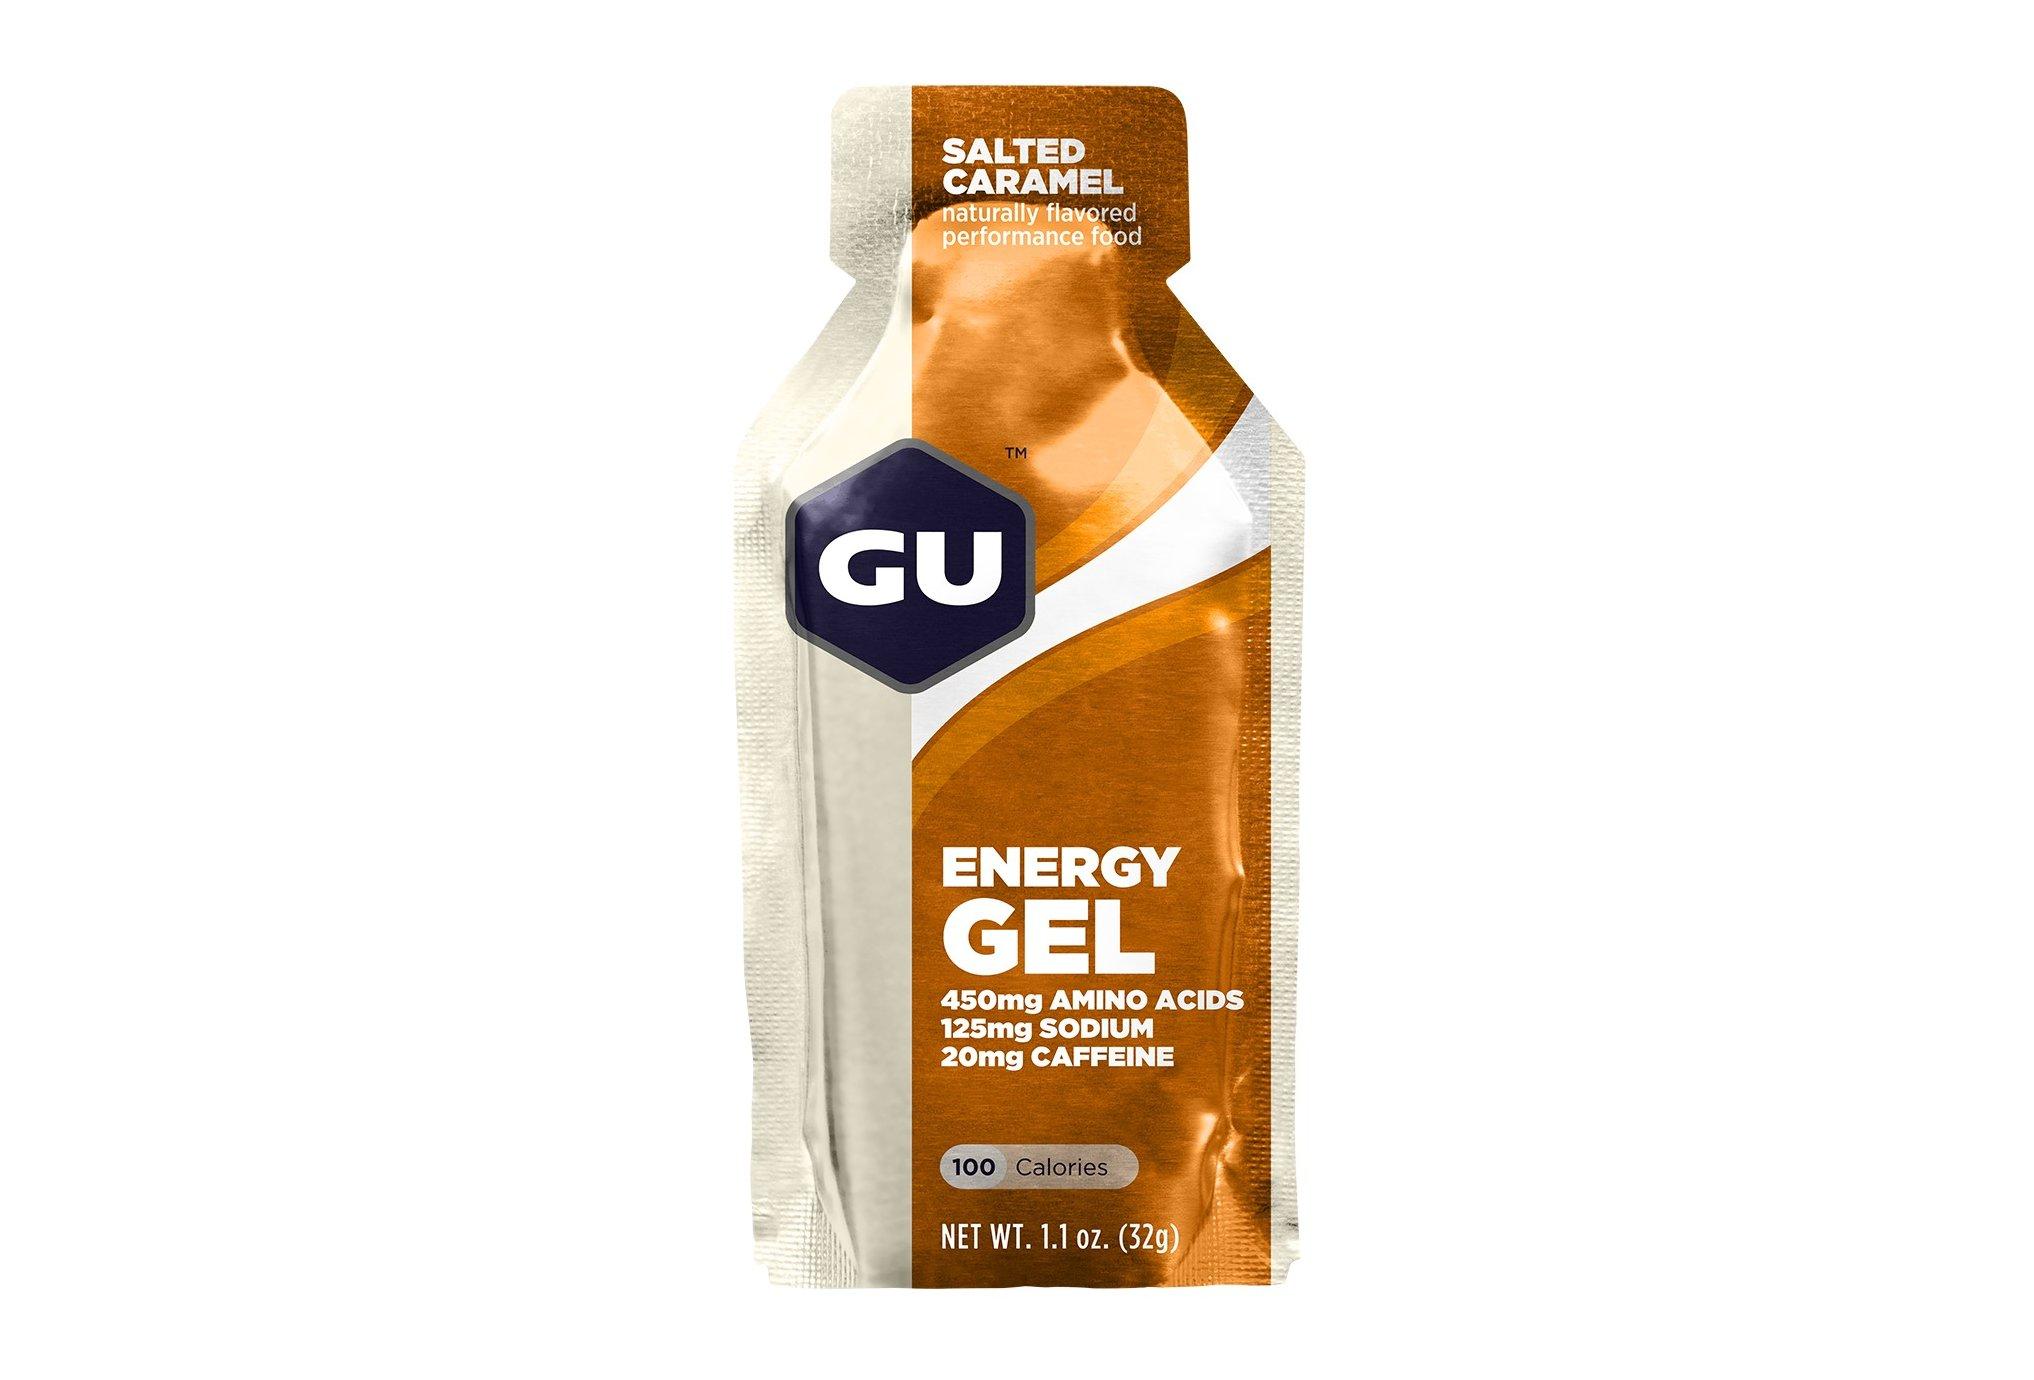 GU Gel Energy - Mantequilla Salada/Caramelo Diététique Gels